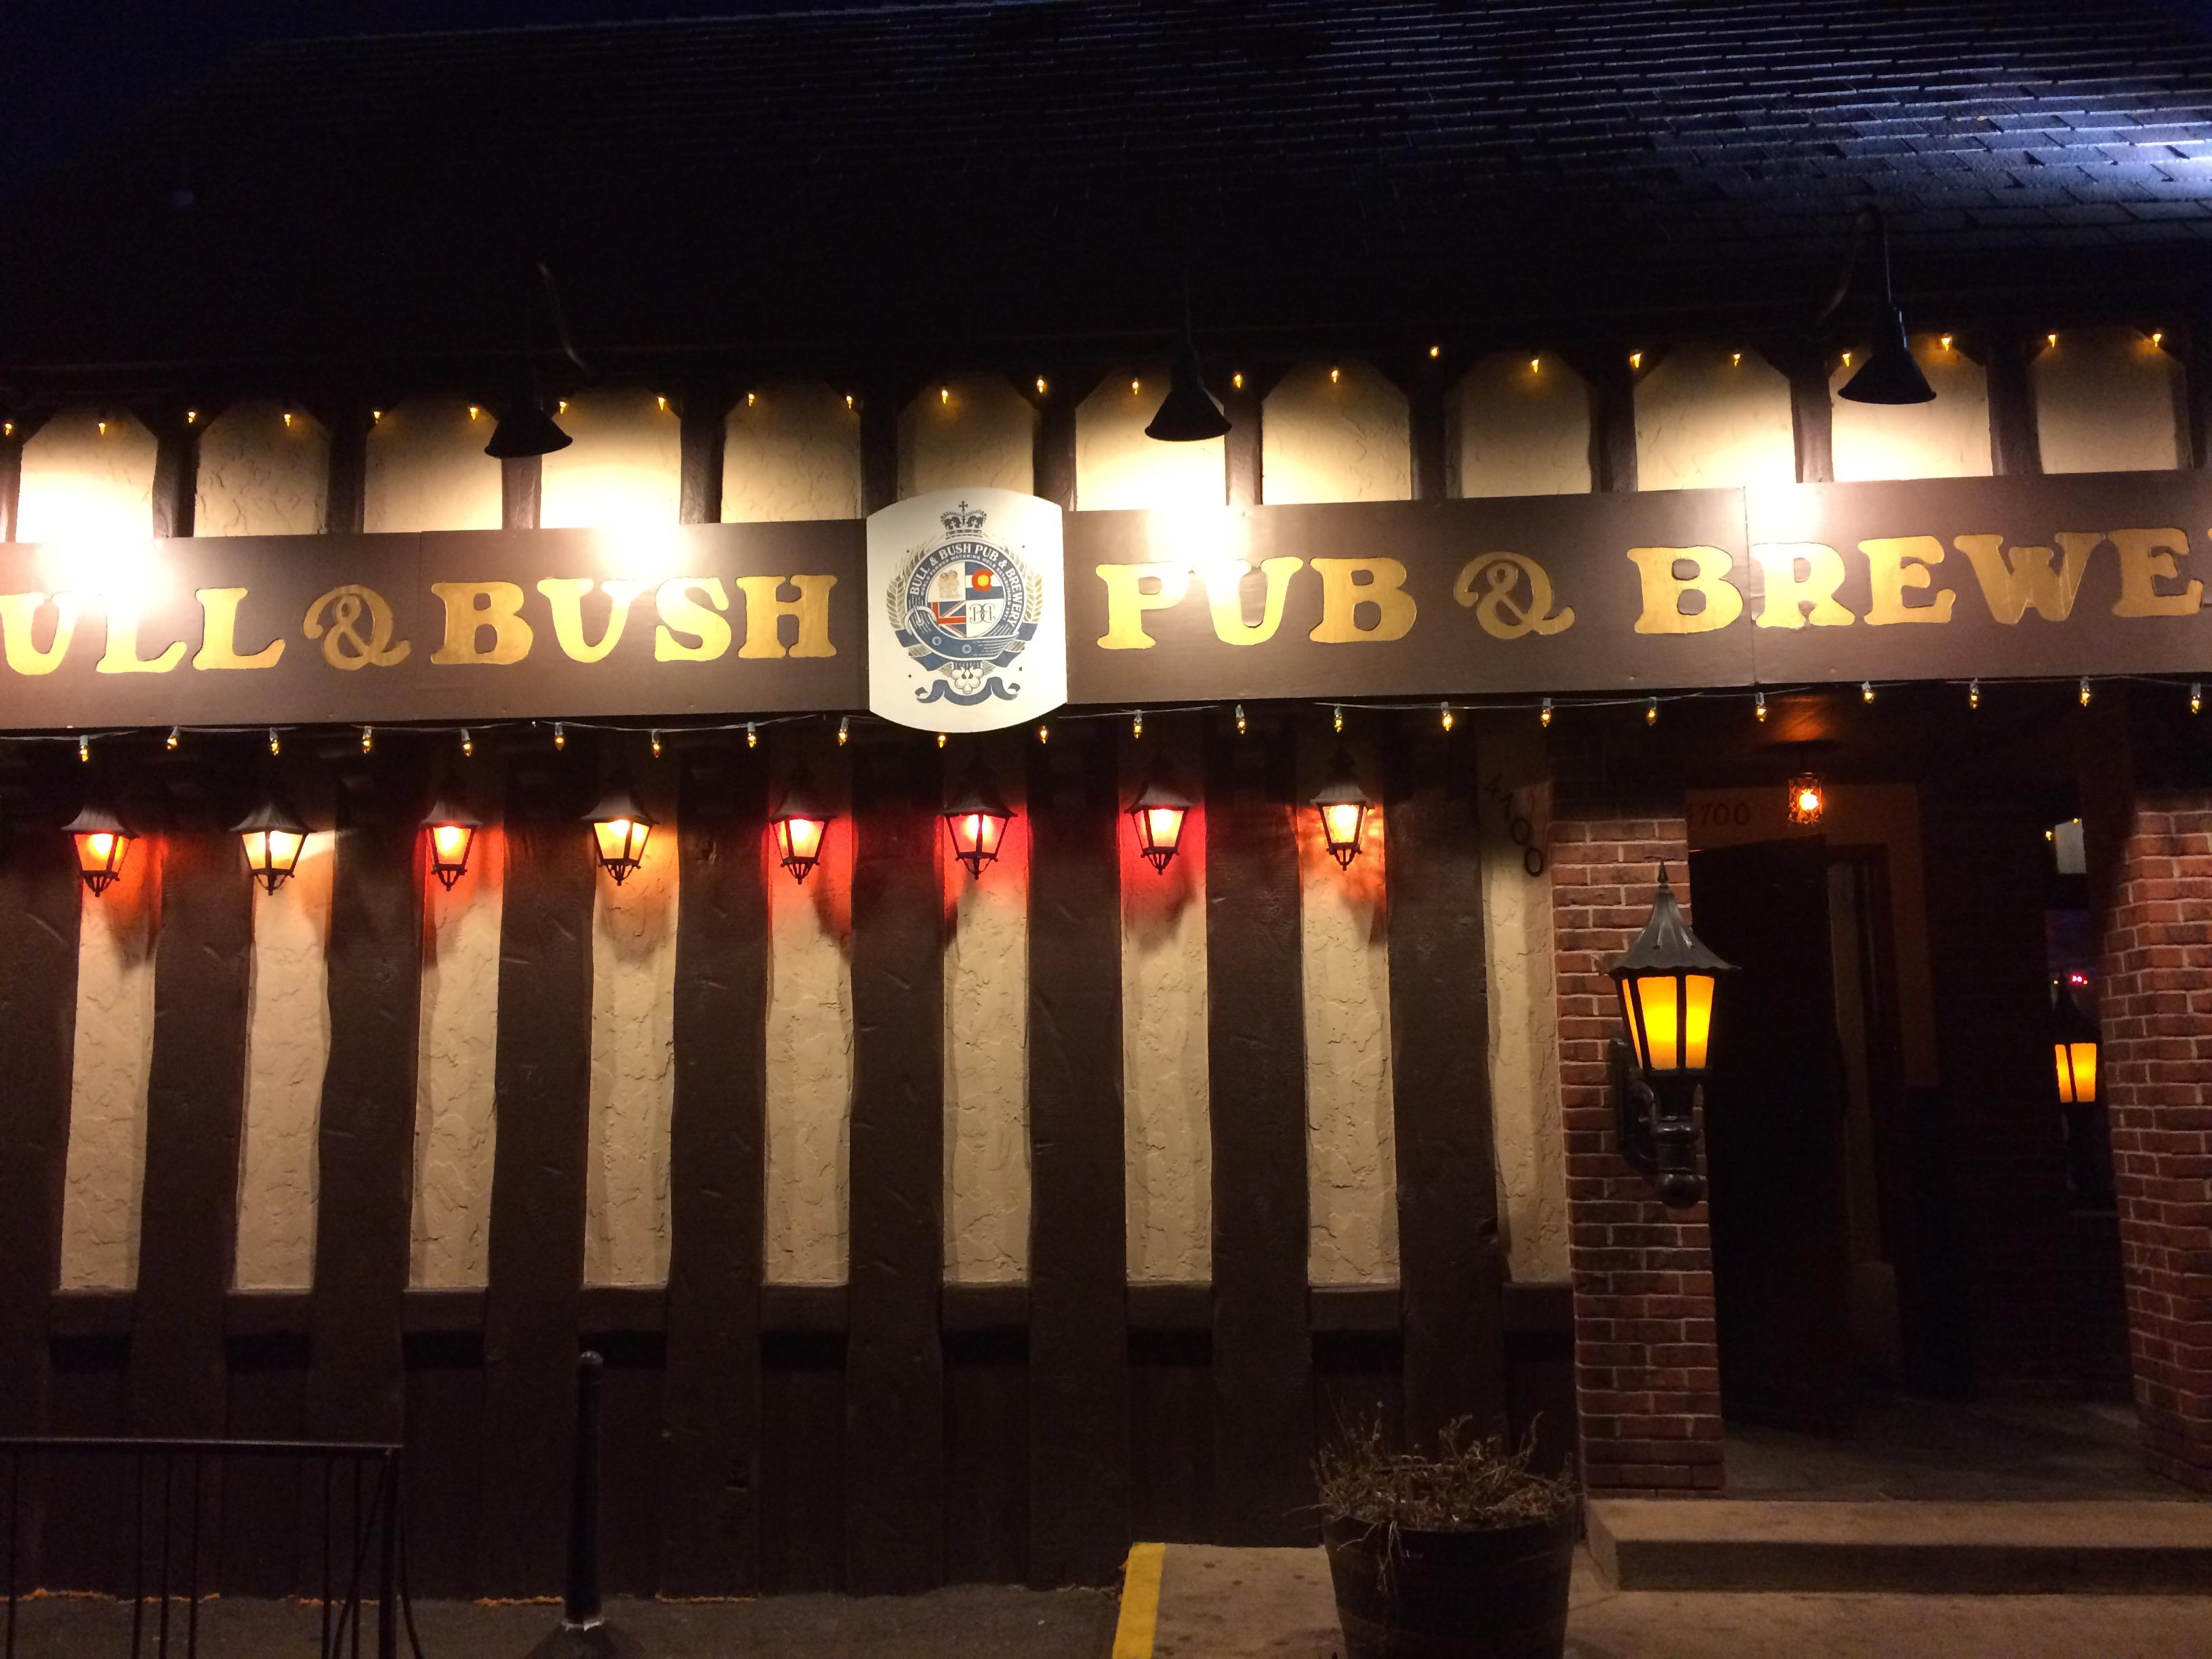 beer-bull___bush-denver-co-bar-microbrewery-tf_tour__14_